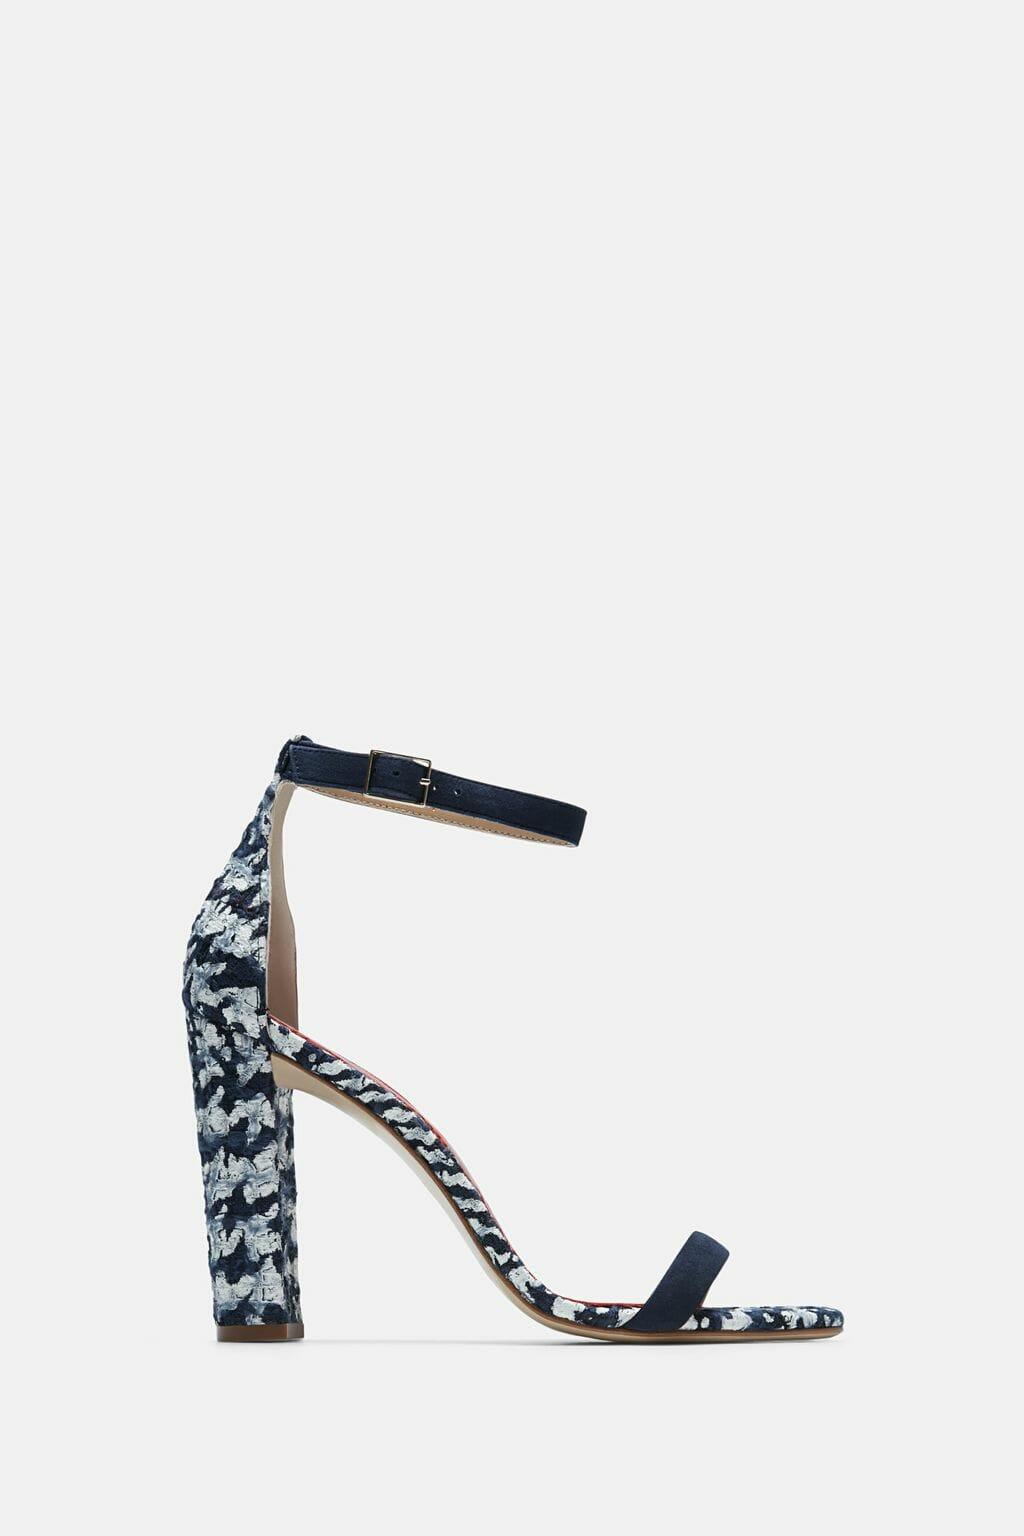 CH-Carolina-herrera-shoes-collection-Spring-Summer-2018-shoe-68